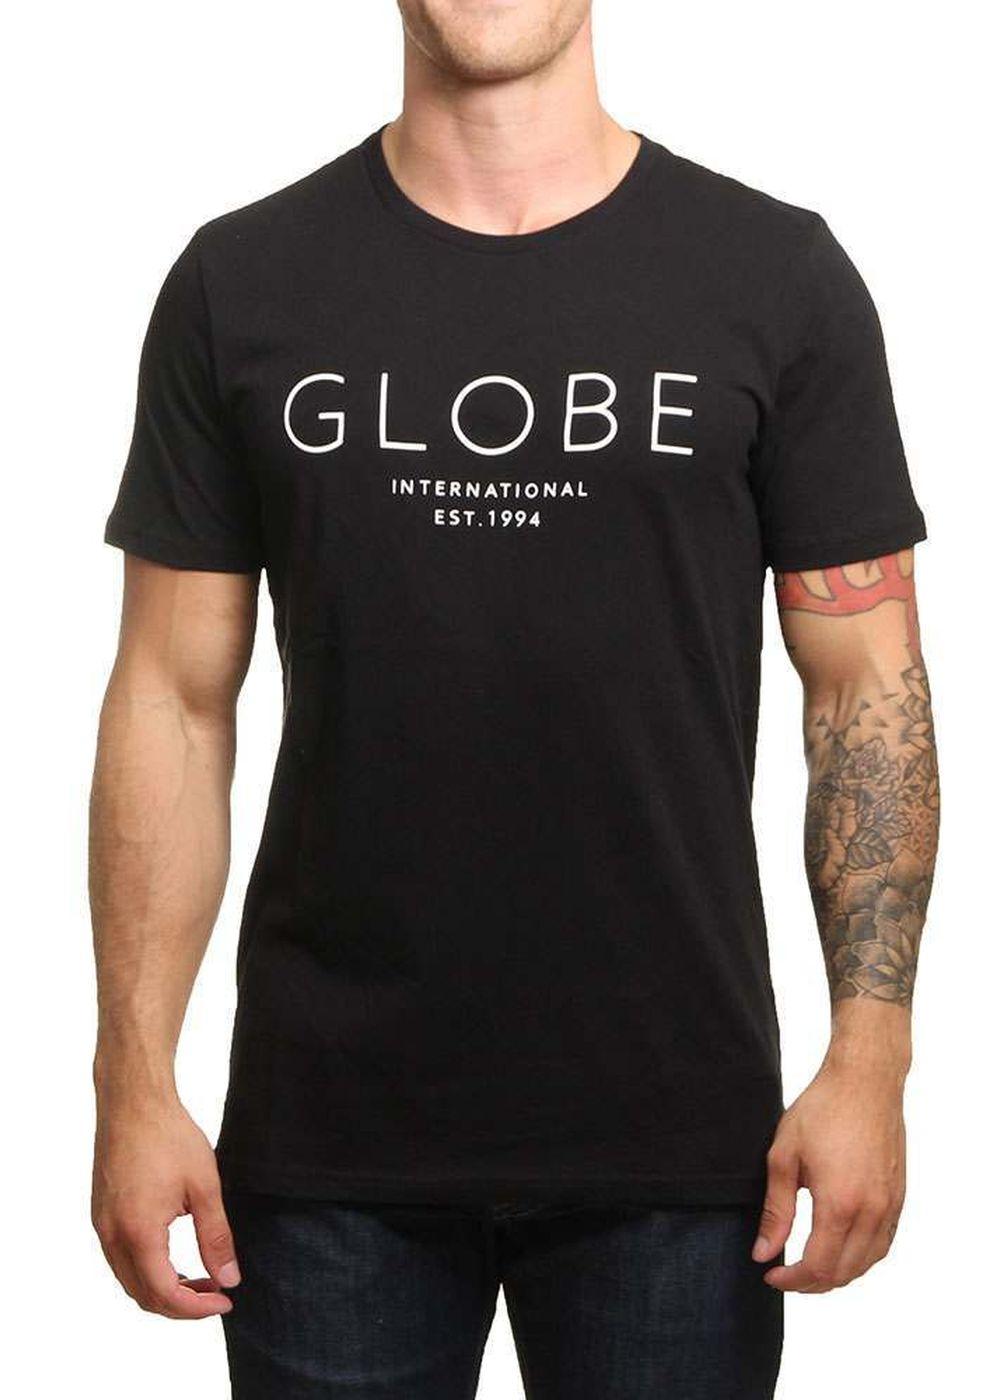 globe-company-tee-black